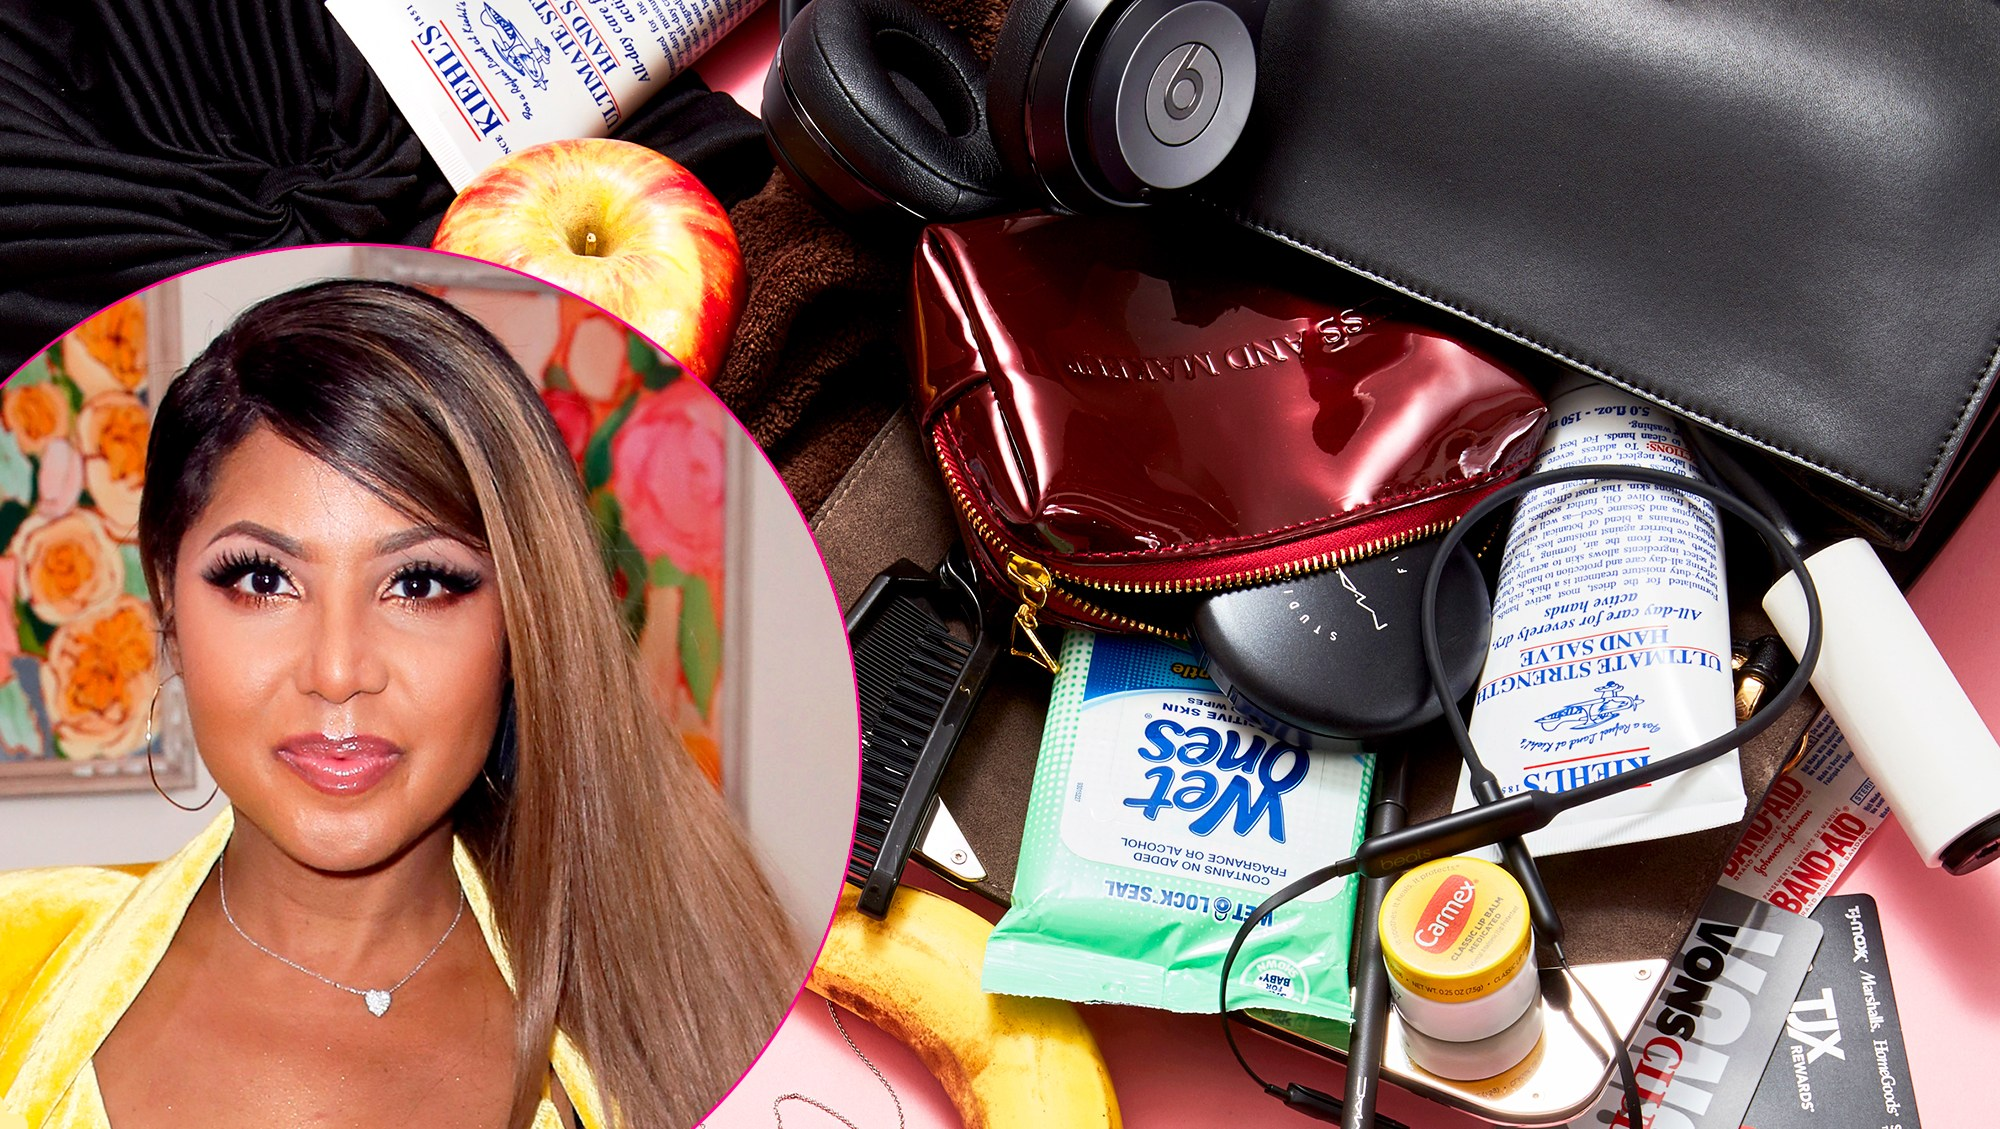 Toni Braxton Bag Promo